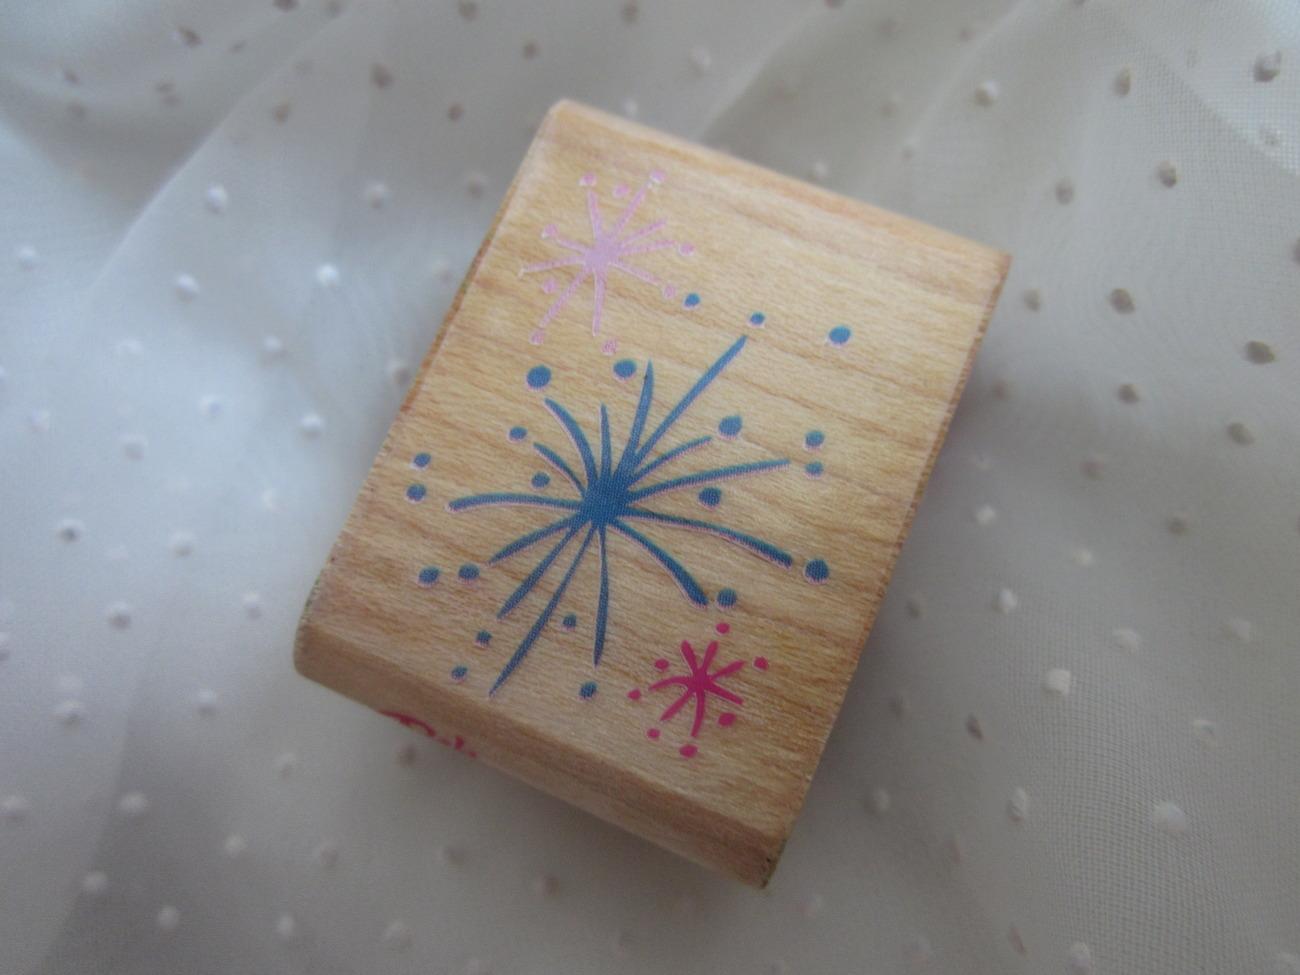 Posh Impressions Glimmering Glitz Fireworks Stamper 4th of July Z366-B